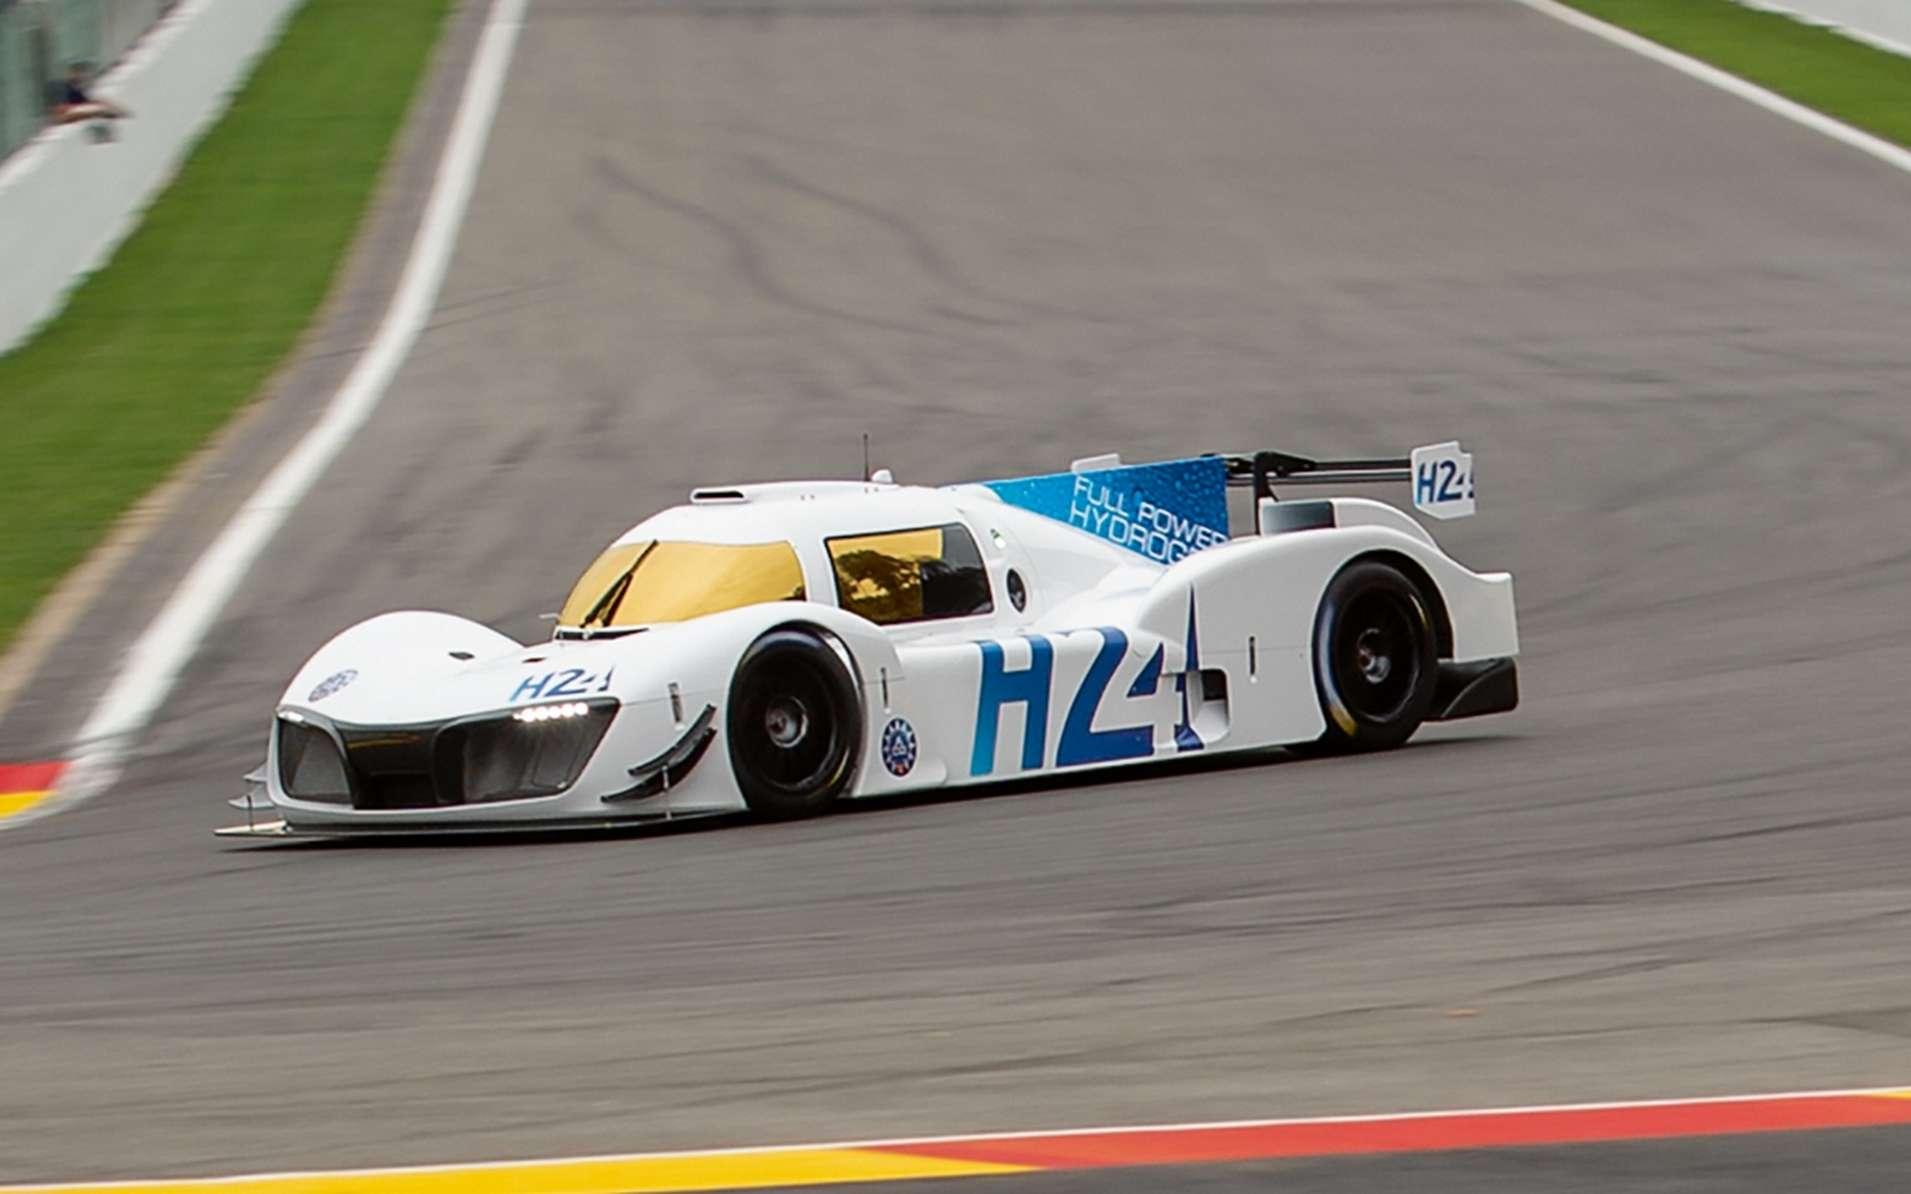 Le prototype à hydrogène LMPH2G de GreenGT. © GreenGT